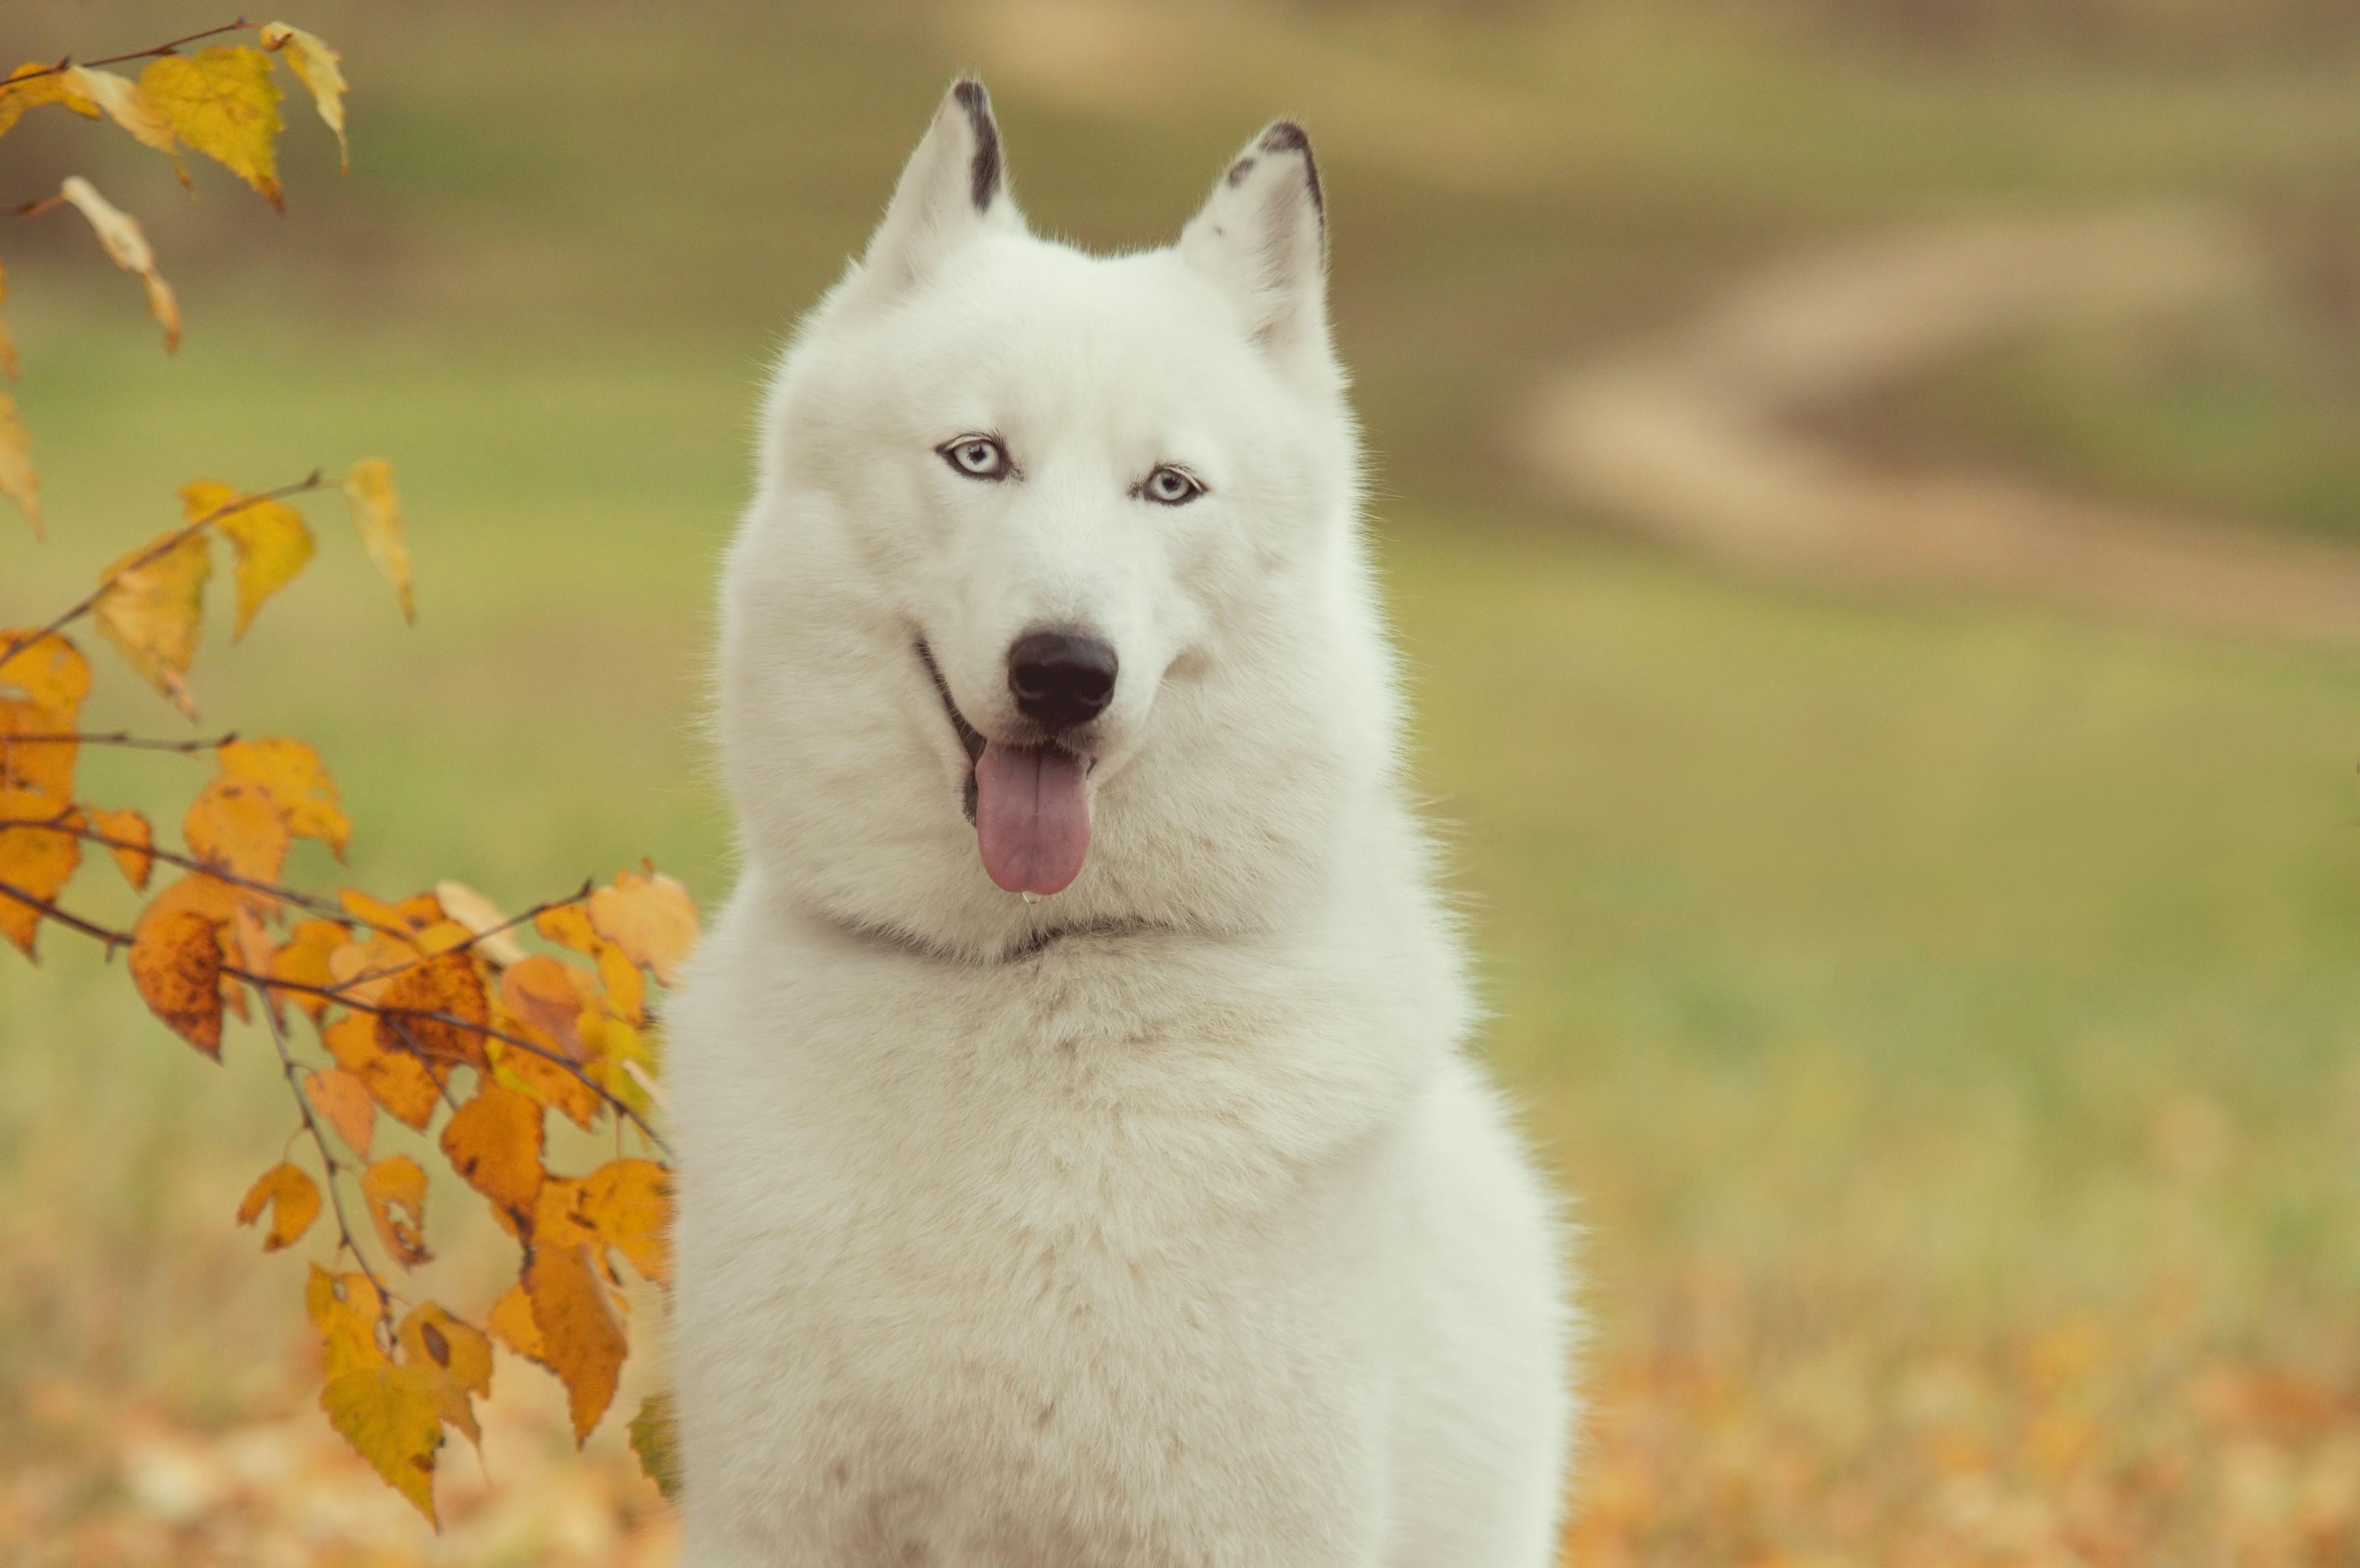 природа белая собака животное улыбка  № 1423914 бесплатно